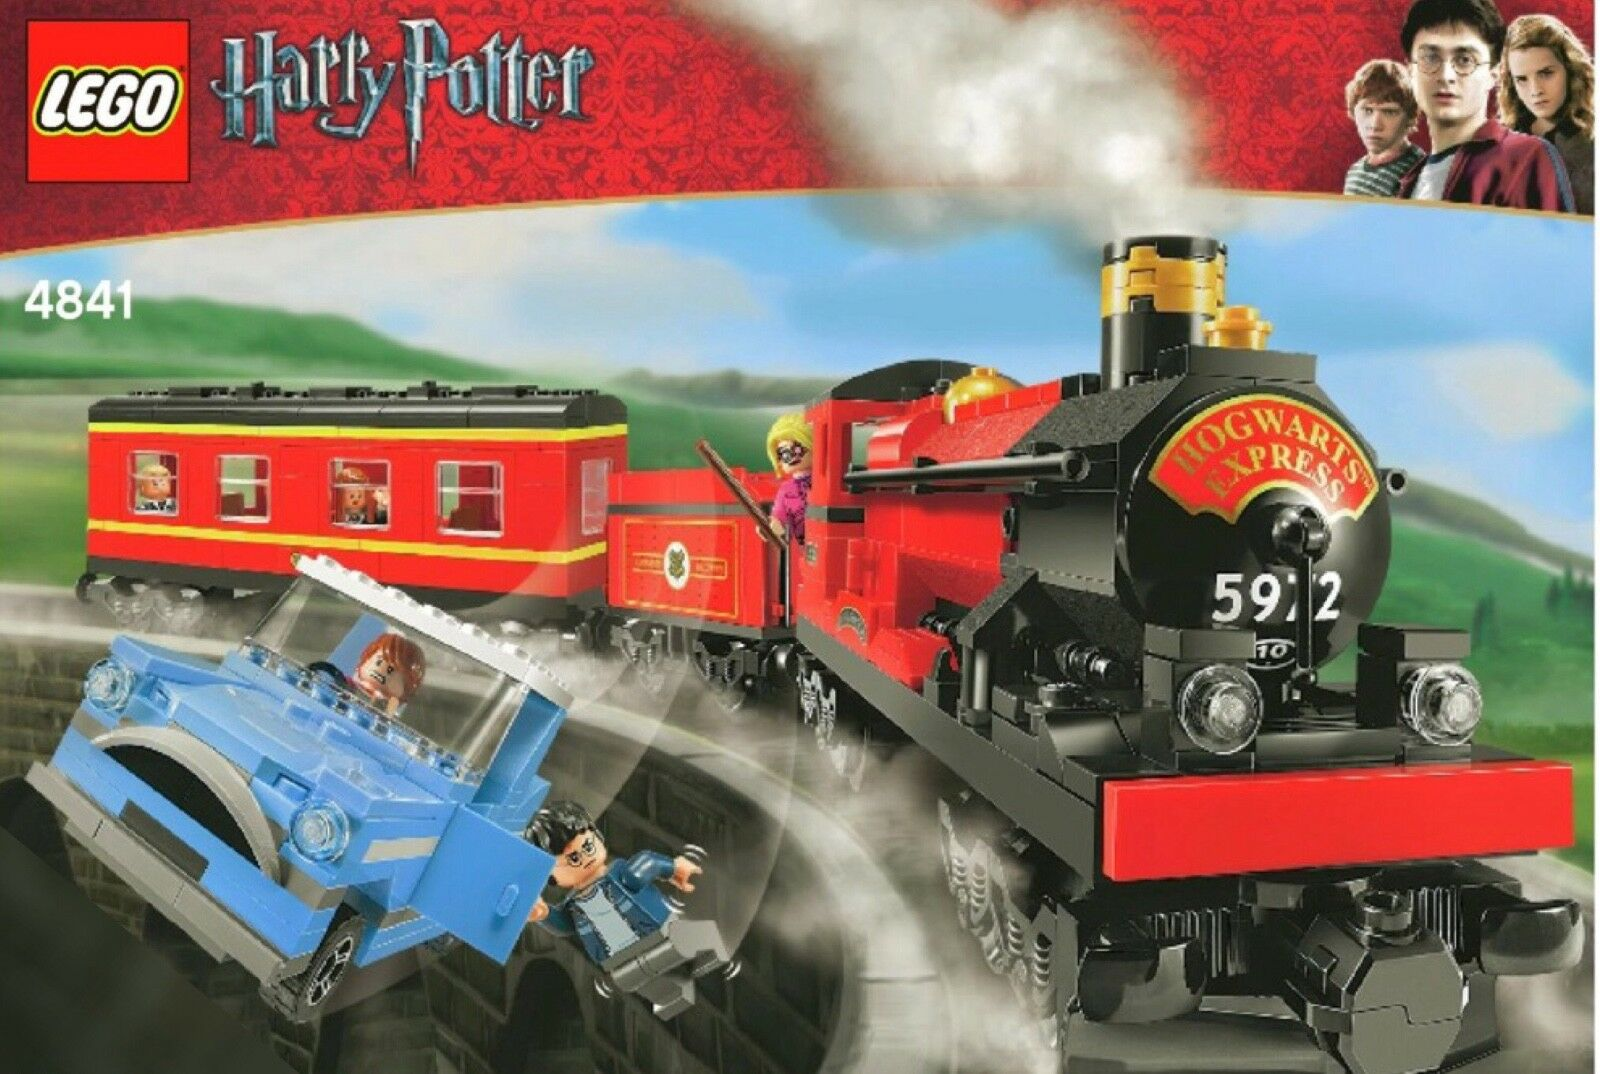 LEGO HARRY POTTER 4841 HOGWARTS EXPRESS TRAIN COMPLETE XLNT + RARE MINIFIGS